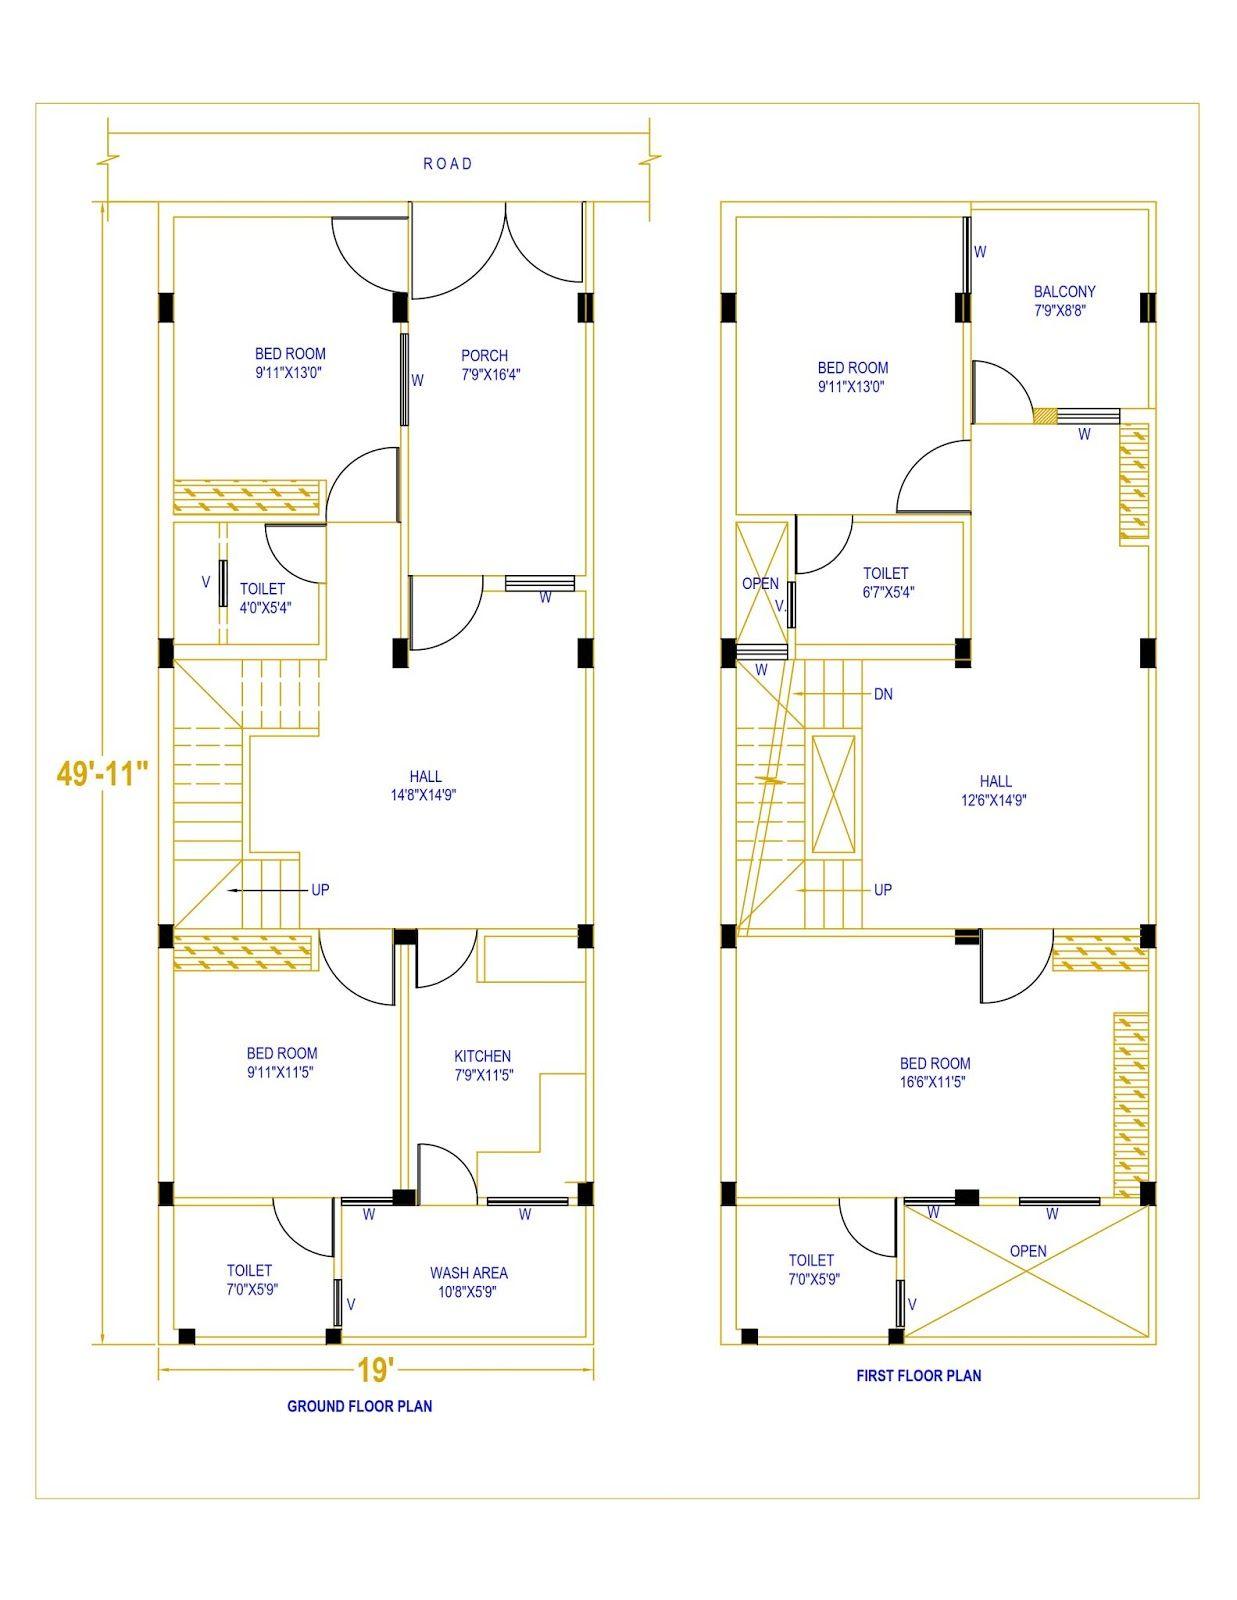 20 X 50 House Plan Housewala In 2020 Family House Plans 2bhk House Plan 20x40 House Plans